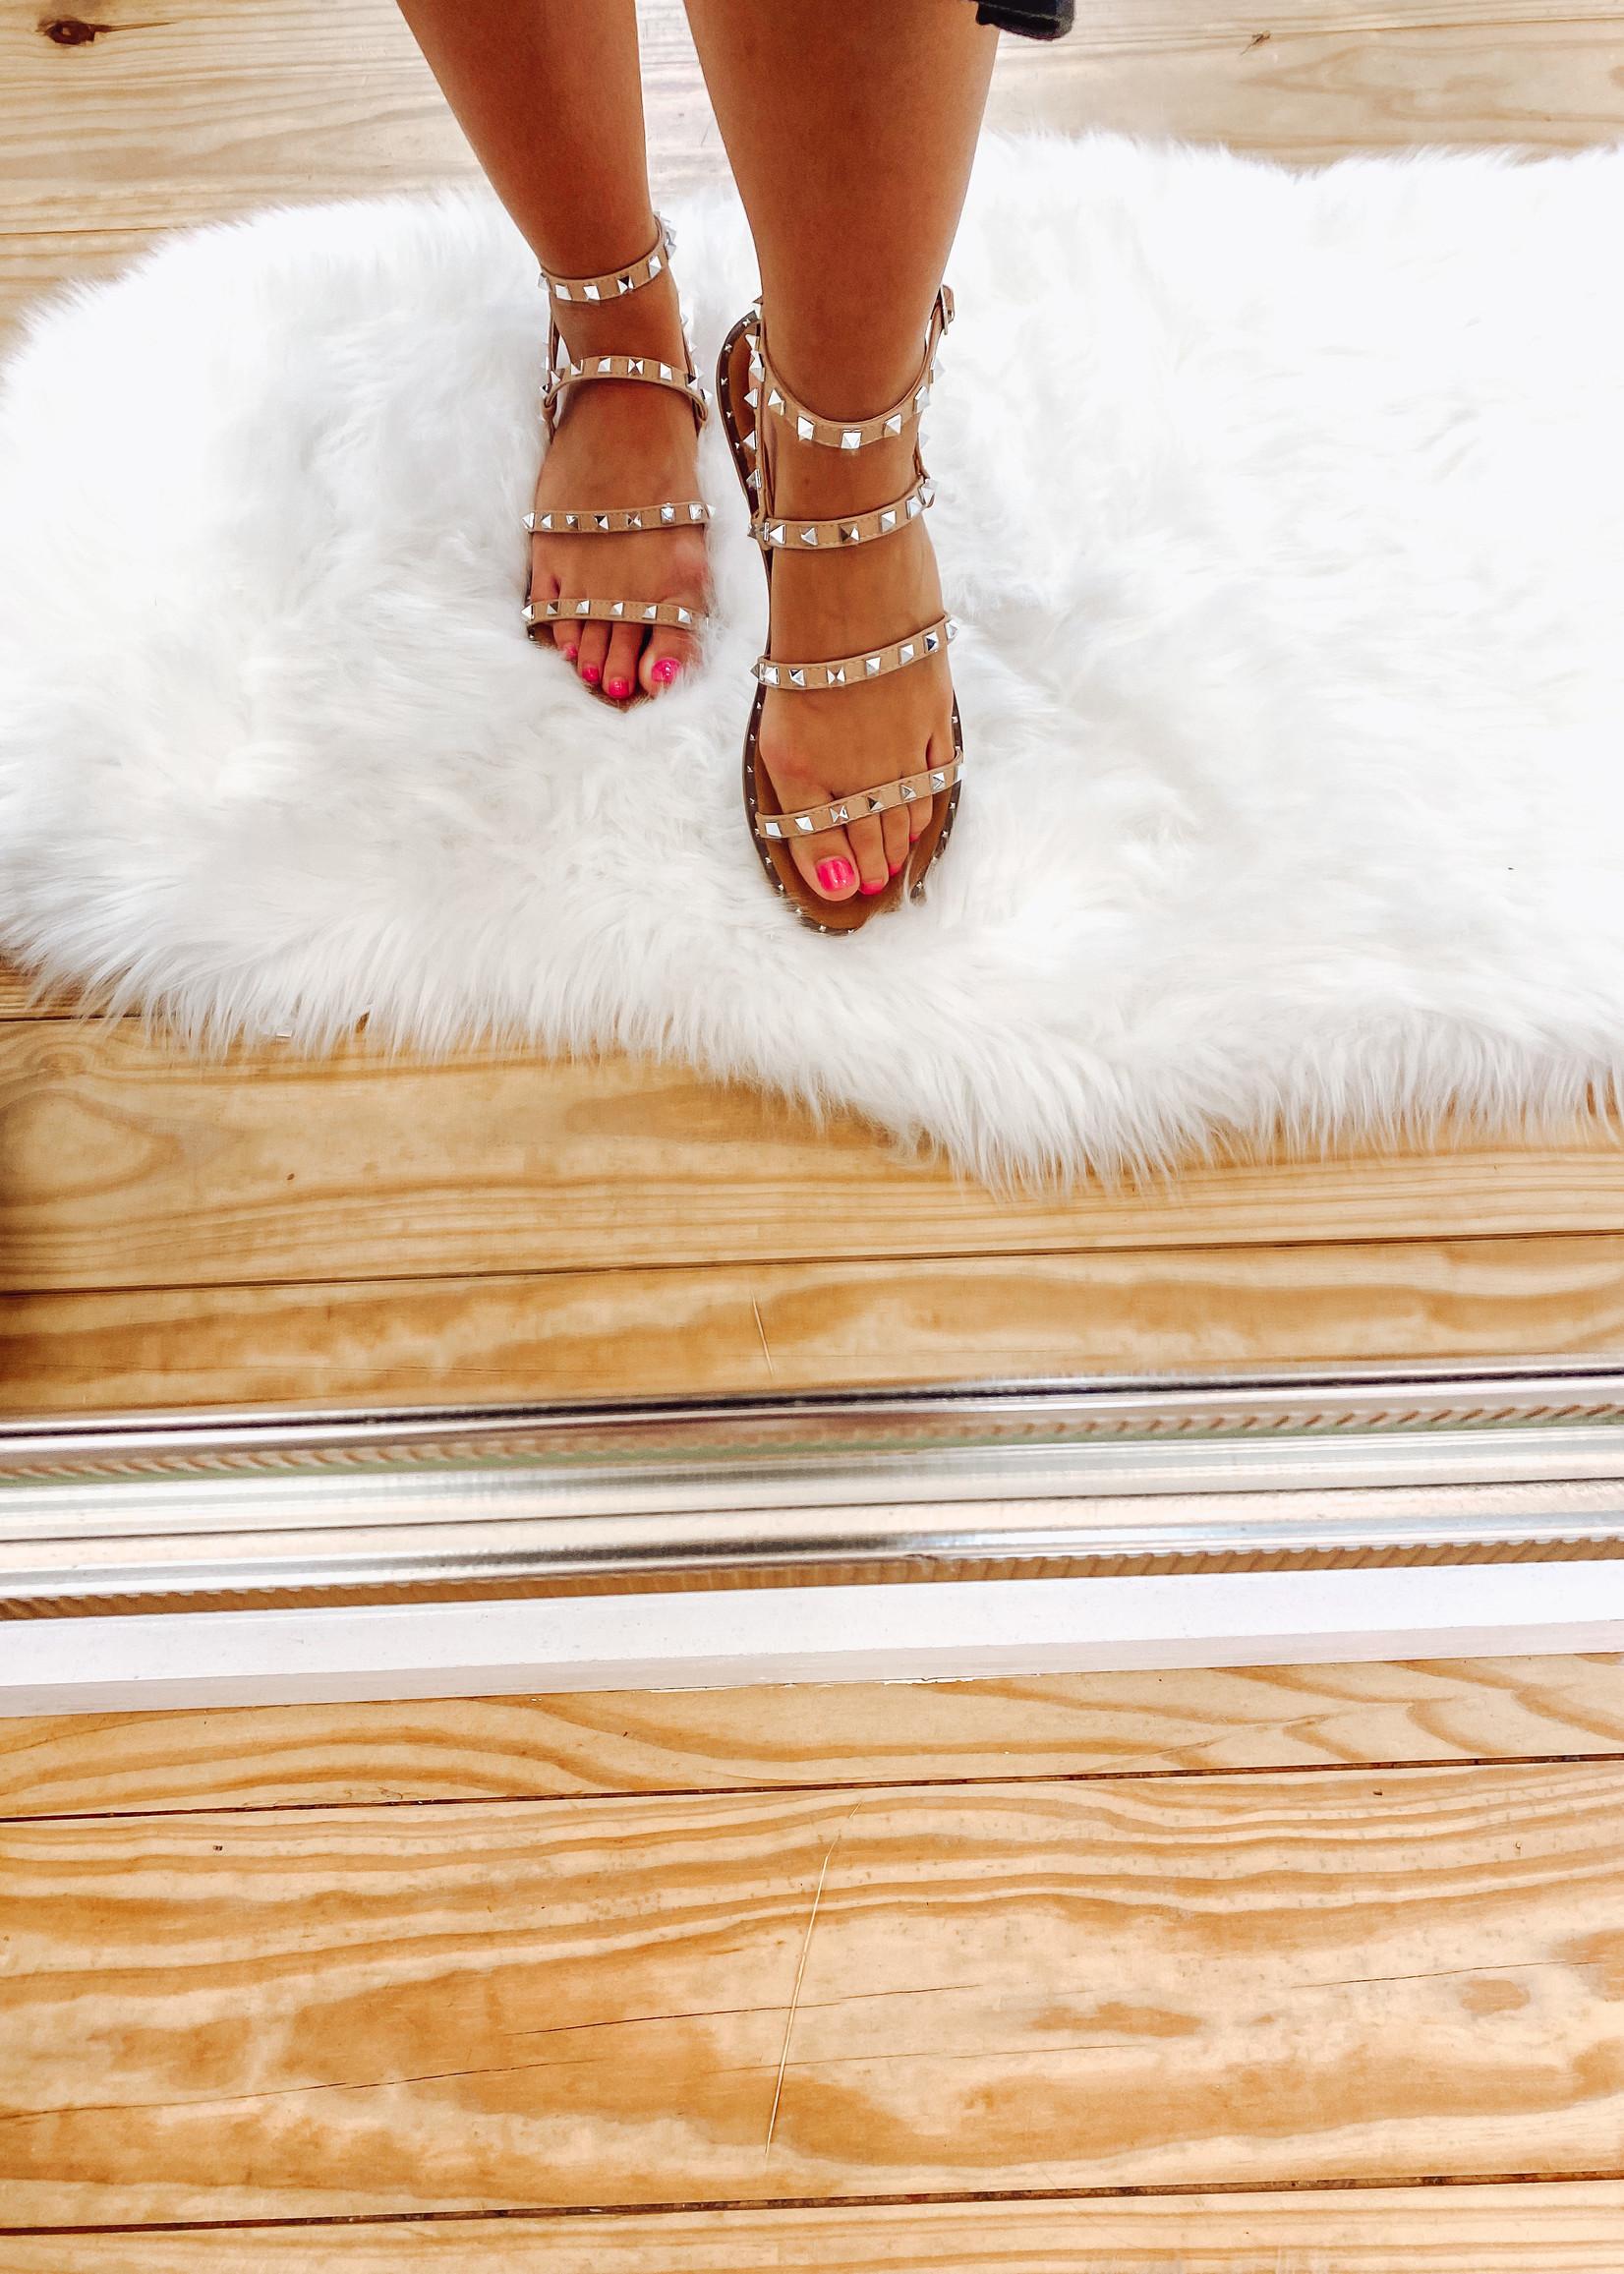 The Bimba Sandal